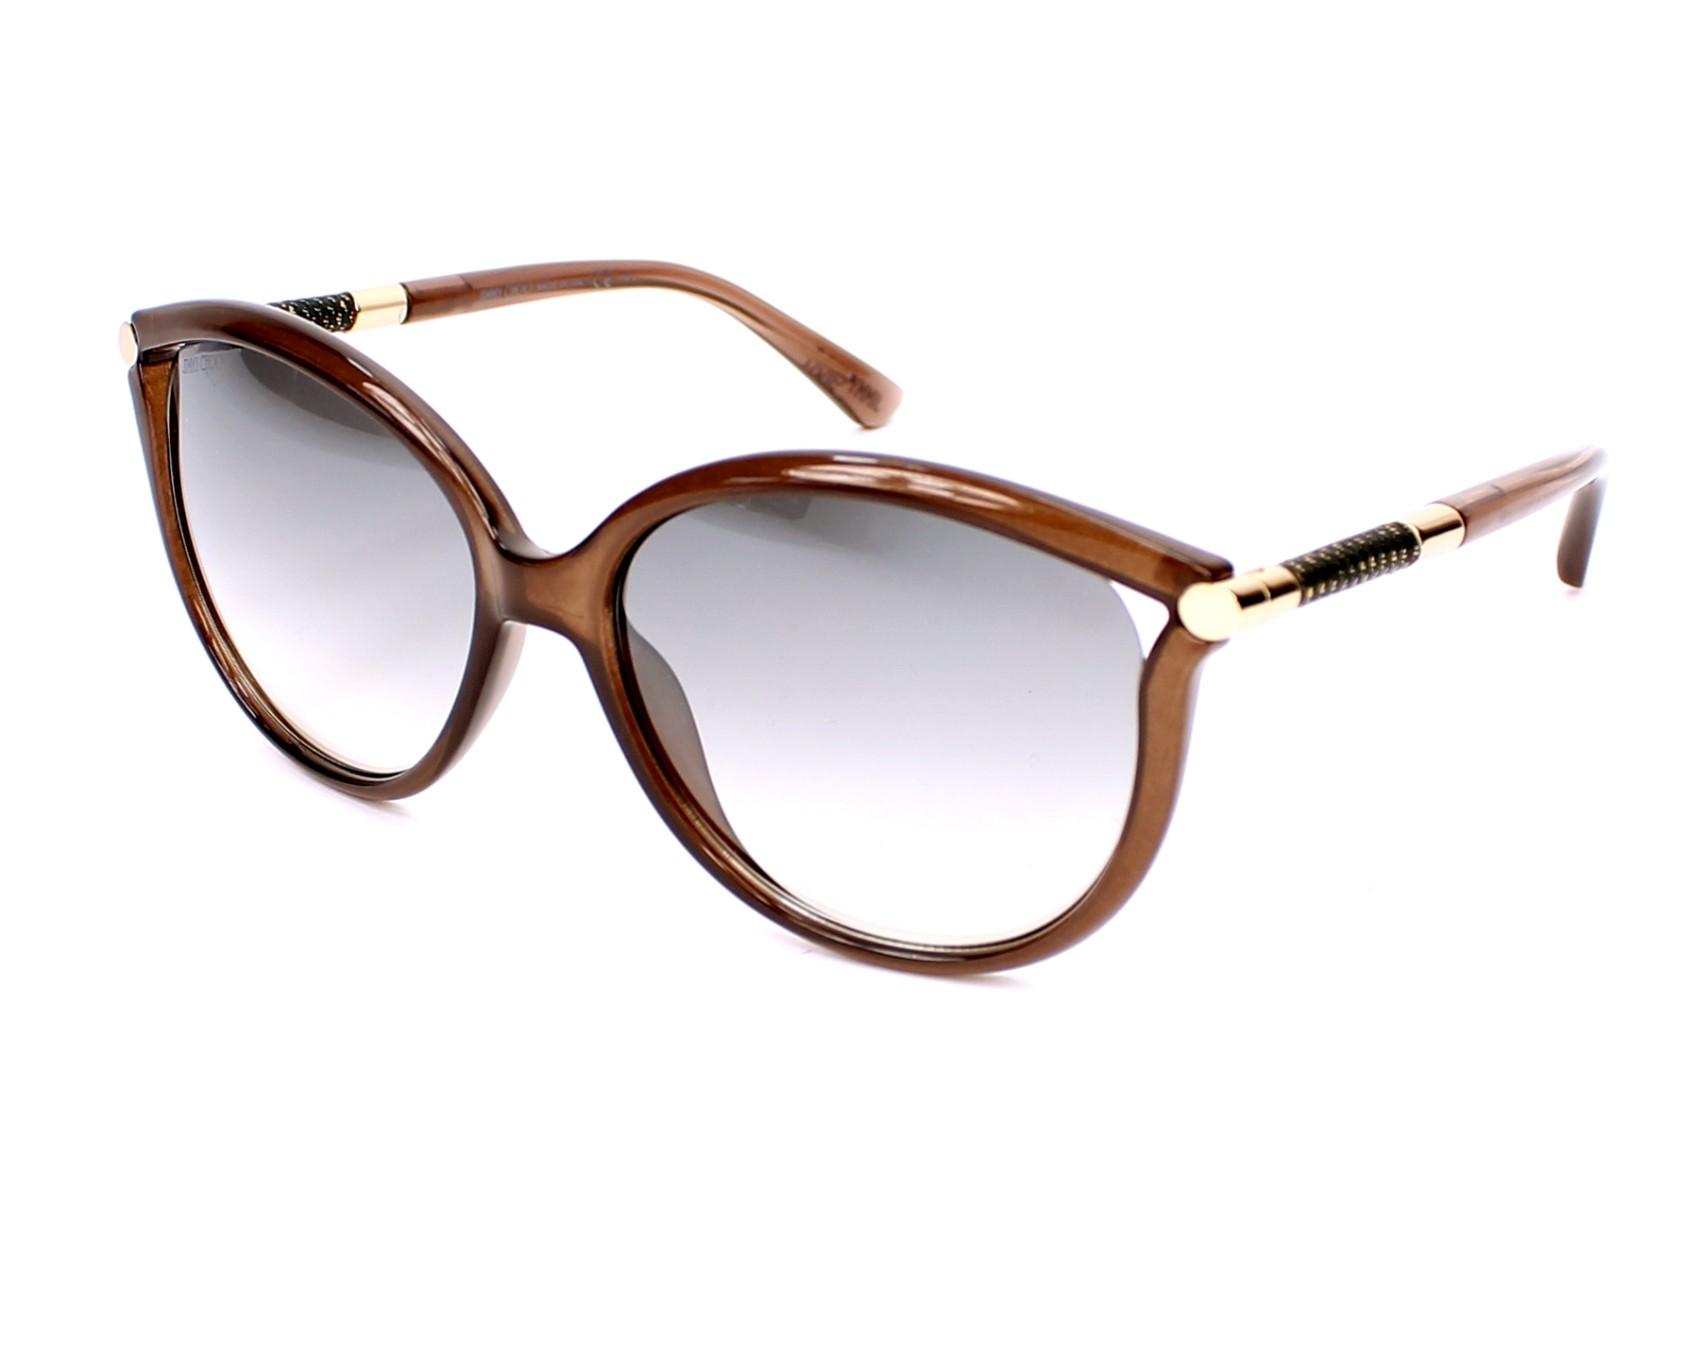 188e5a81533 thumbnail Sunglasses Jimmy Choo GIORGY-S QD9 IC - Brown profile view